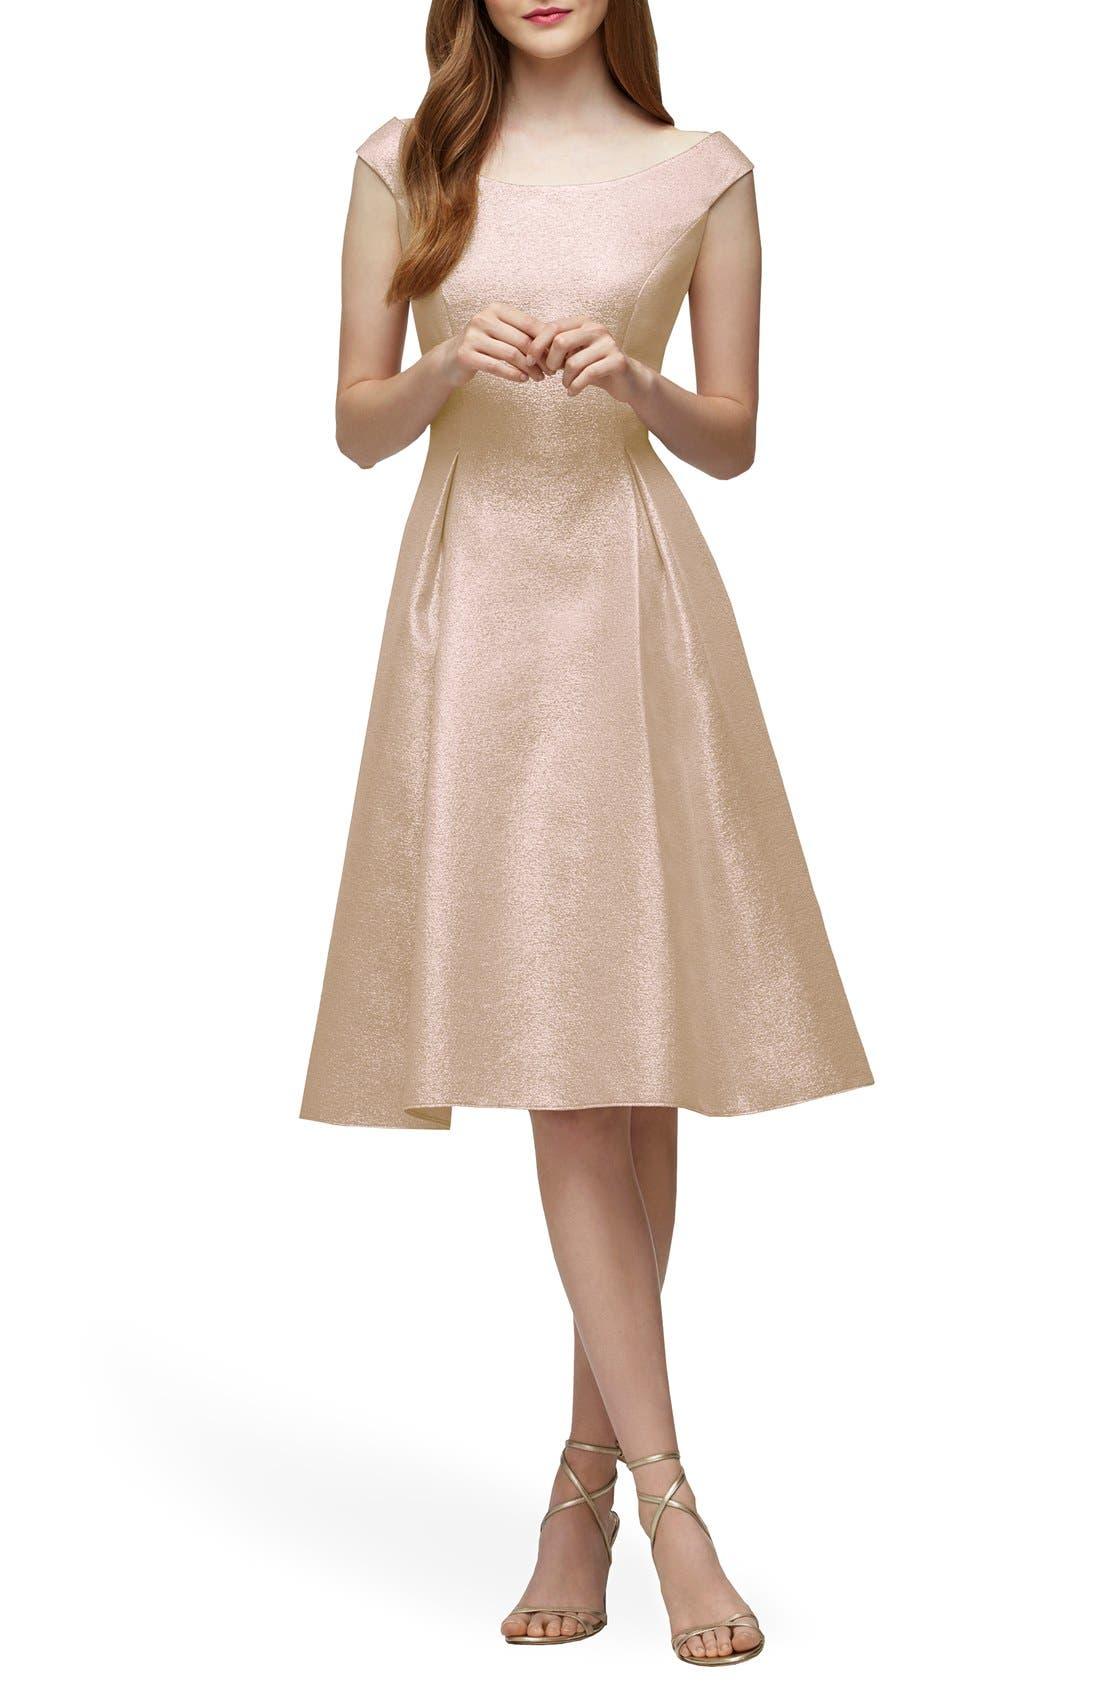 Alternate Image 1 Selected - Lela Rose Bridesmaid Portrait Neck Metallic Fit & Flare Dress